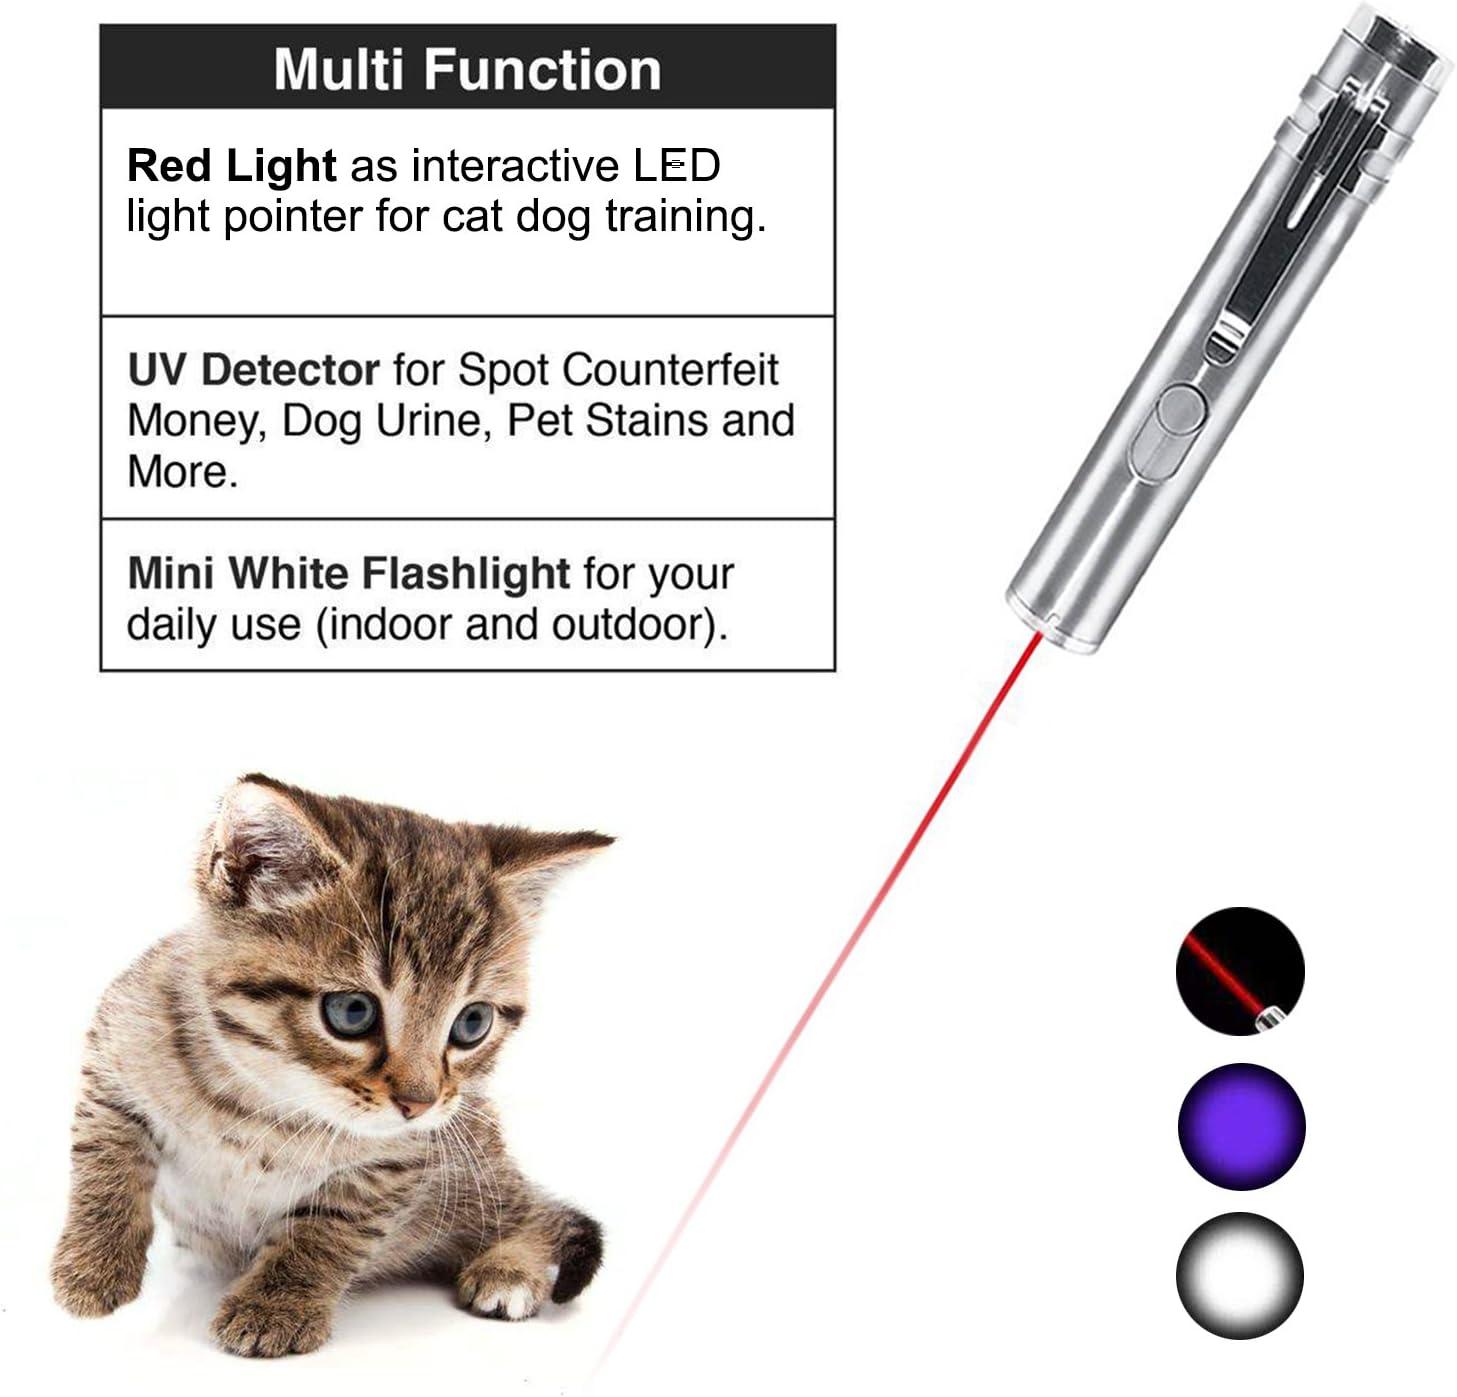 YAMI Juguetes para Gatos Cat Juguetes interactivos para Gatos 3 en 1 Juguetes Divertidos para Gatos con USB cargable: Amazon.es: Productos para mascotas